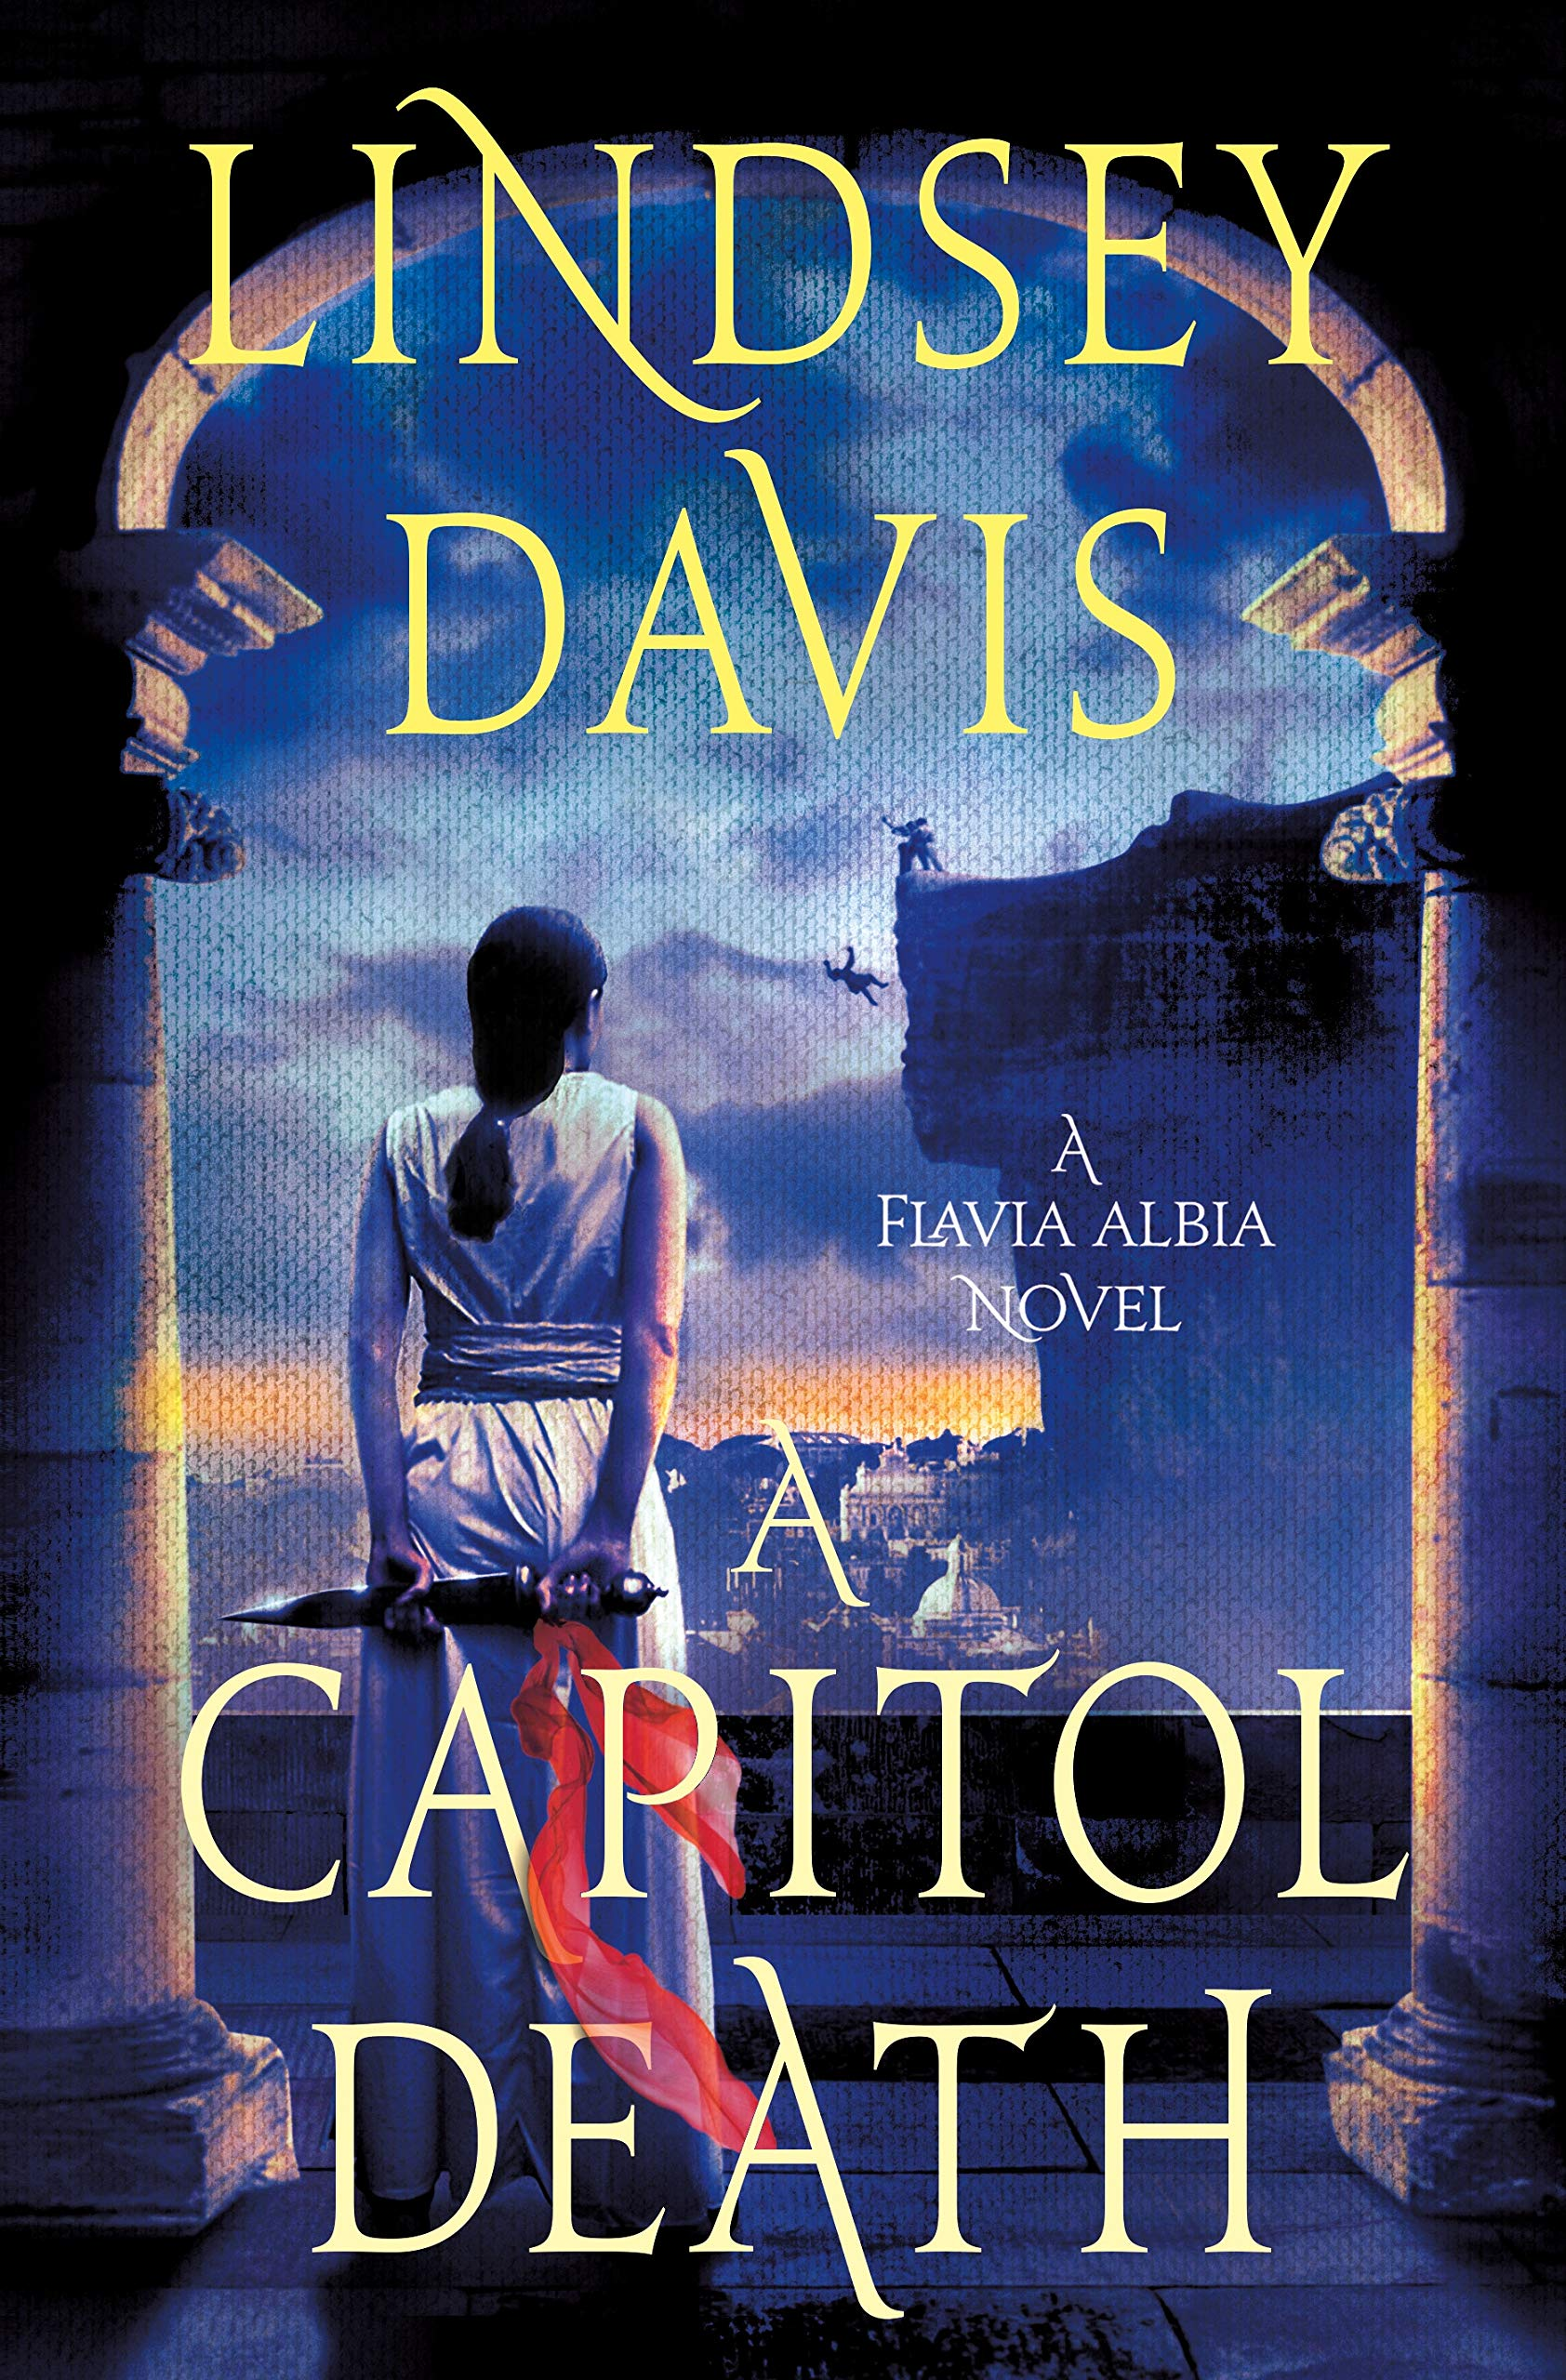 bd0cc53f1ee8 A Capitol Death: A Flavia Albia Novel (Flavia Albia Series): Lindsey ...